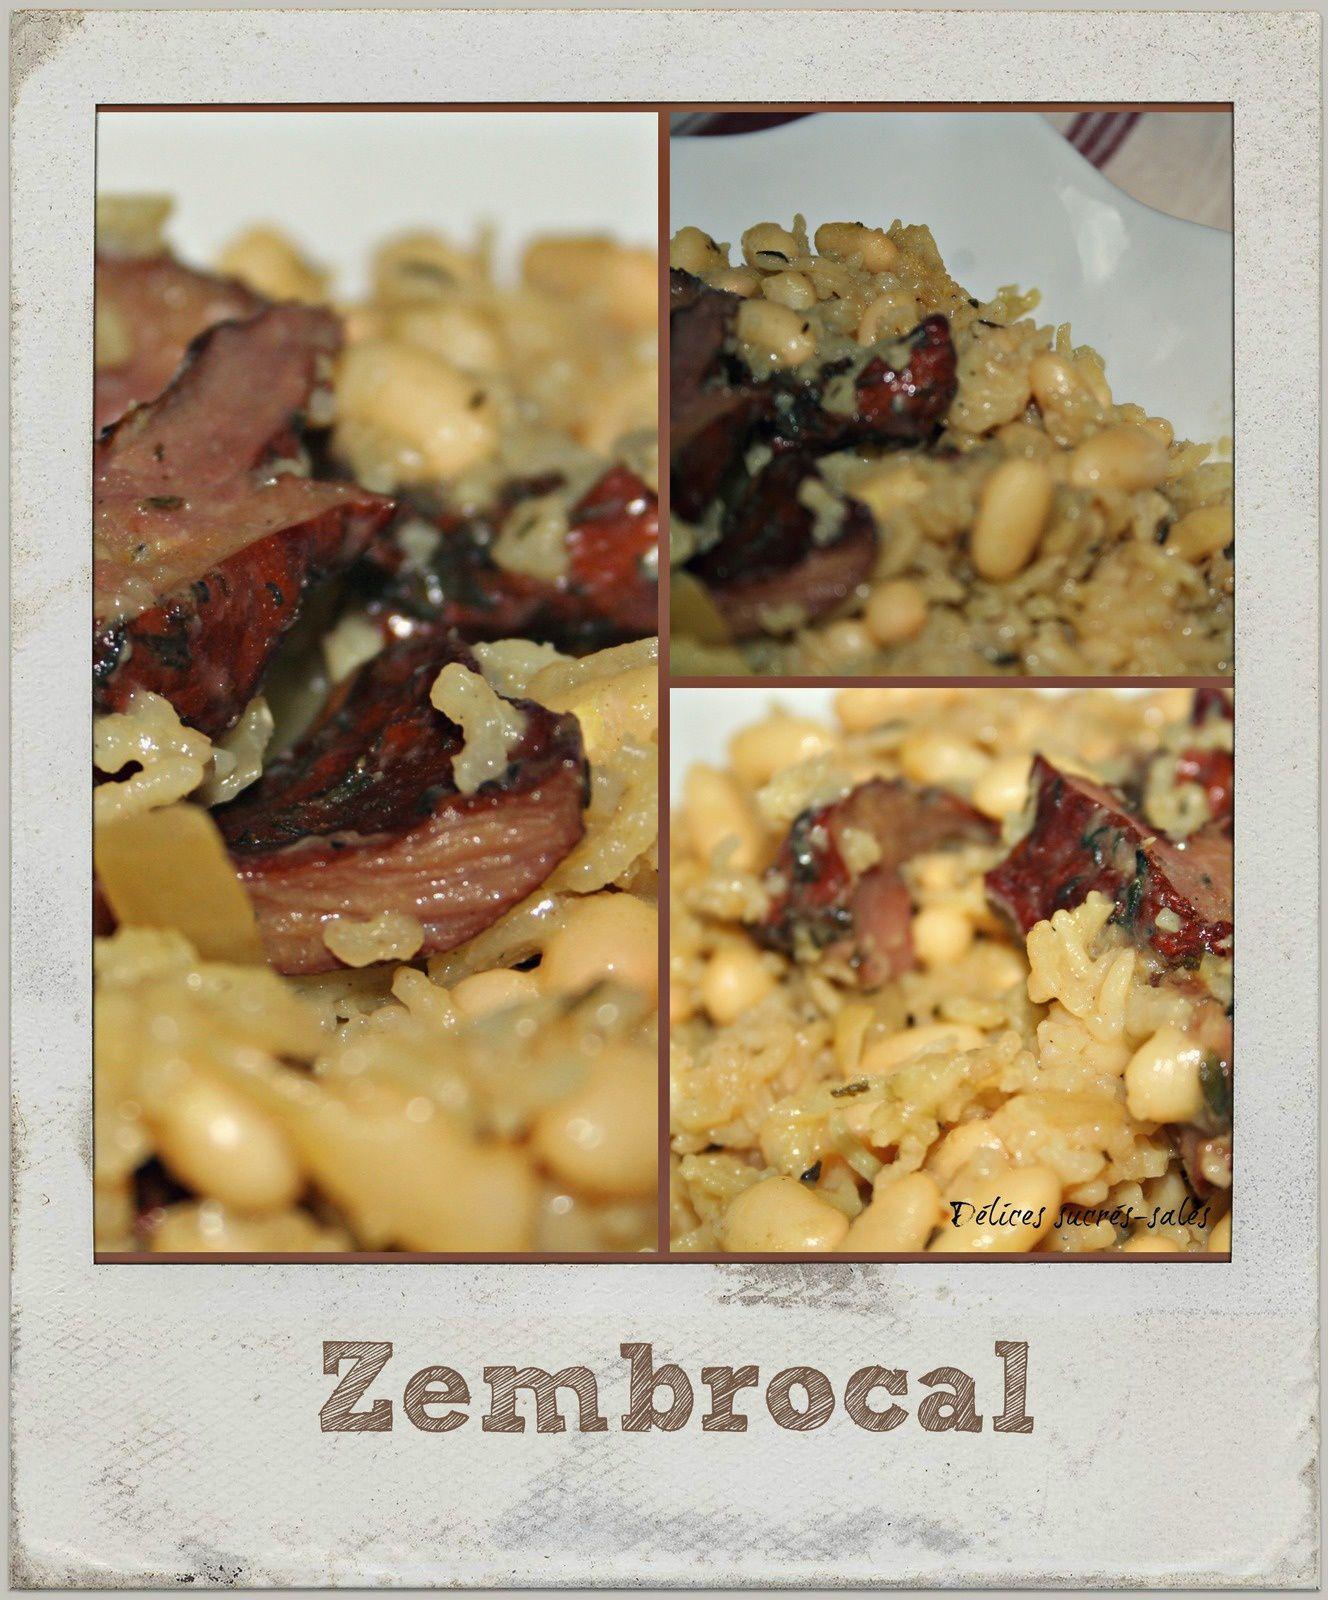 Zembrocal